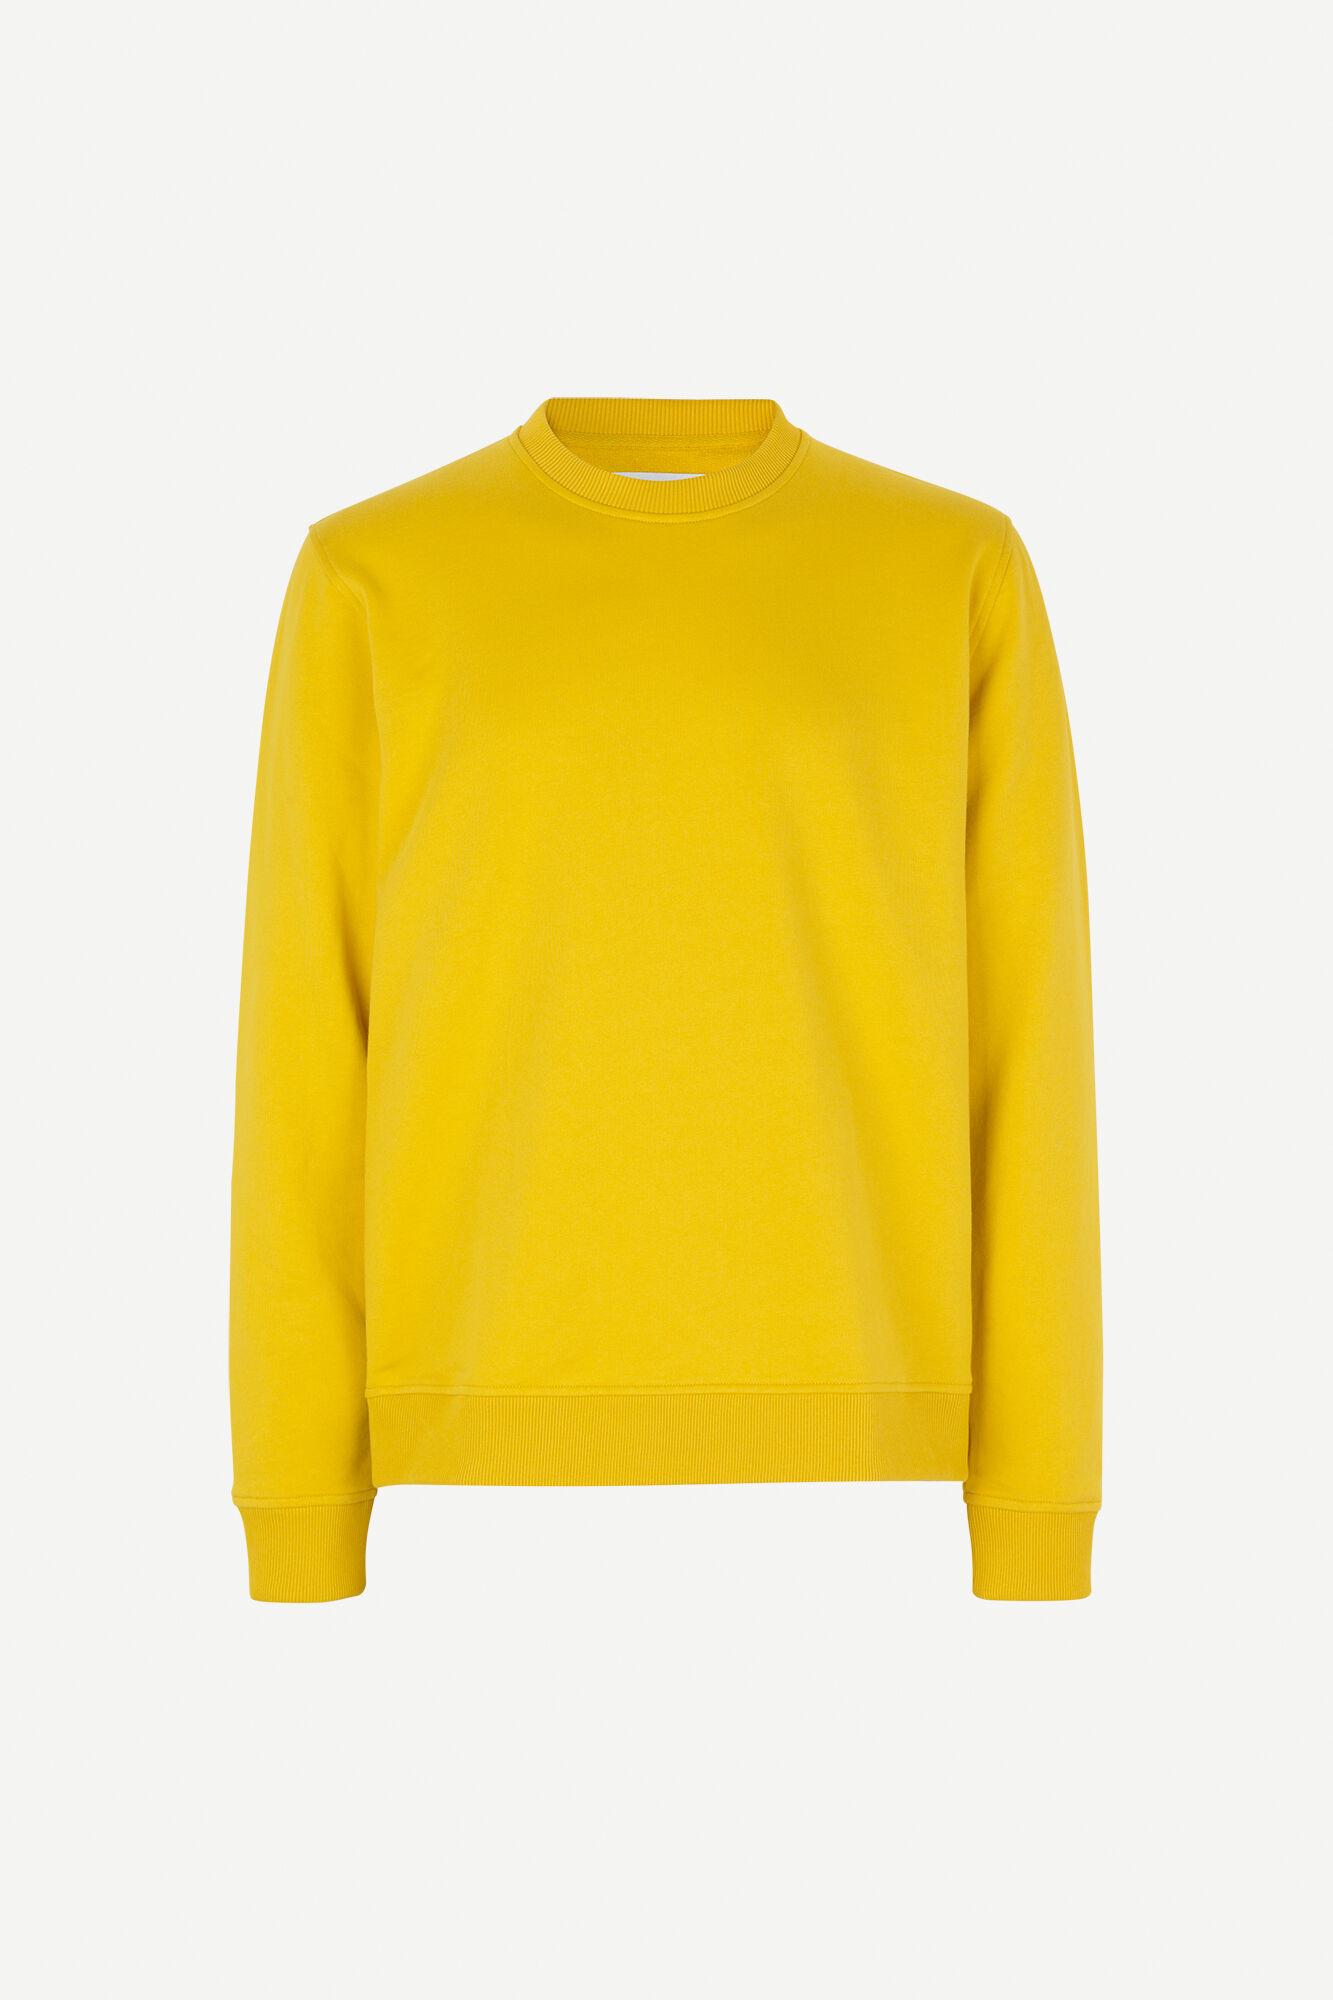 Aviso Crew Neck Sweater Lemon Curry Yellow-1